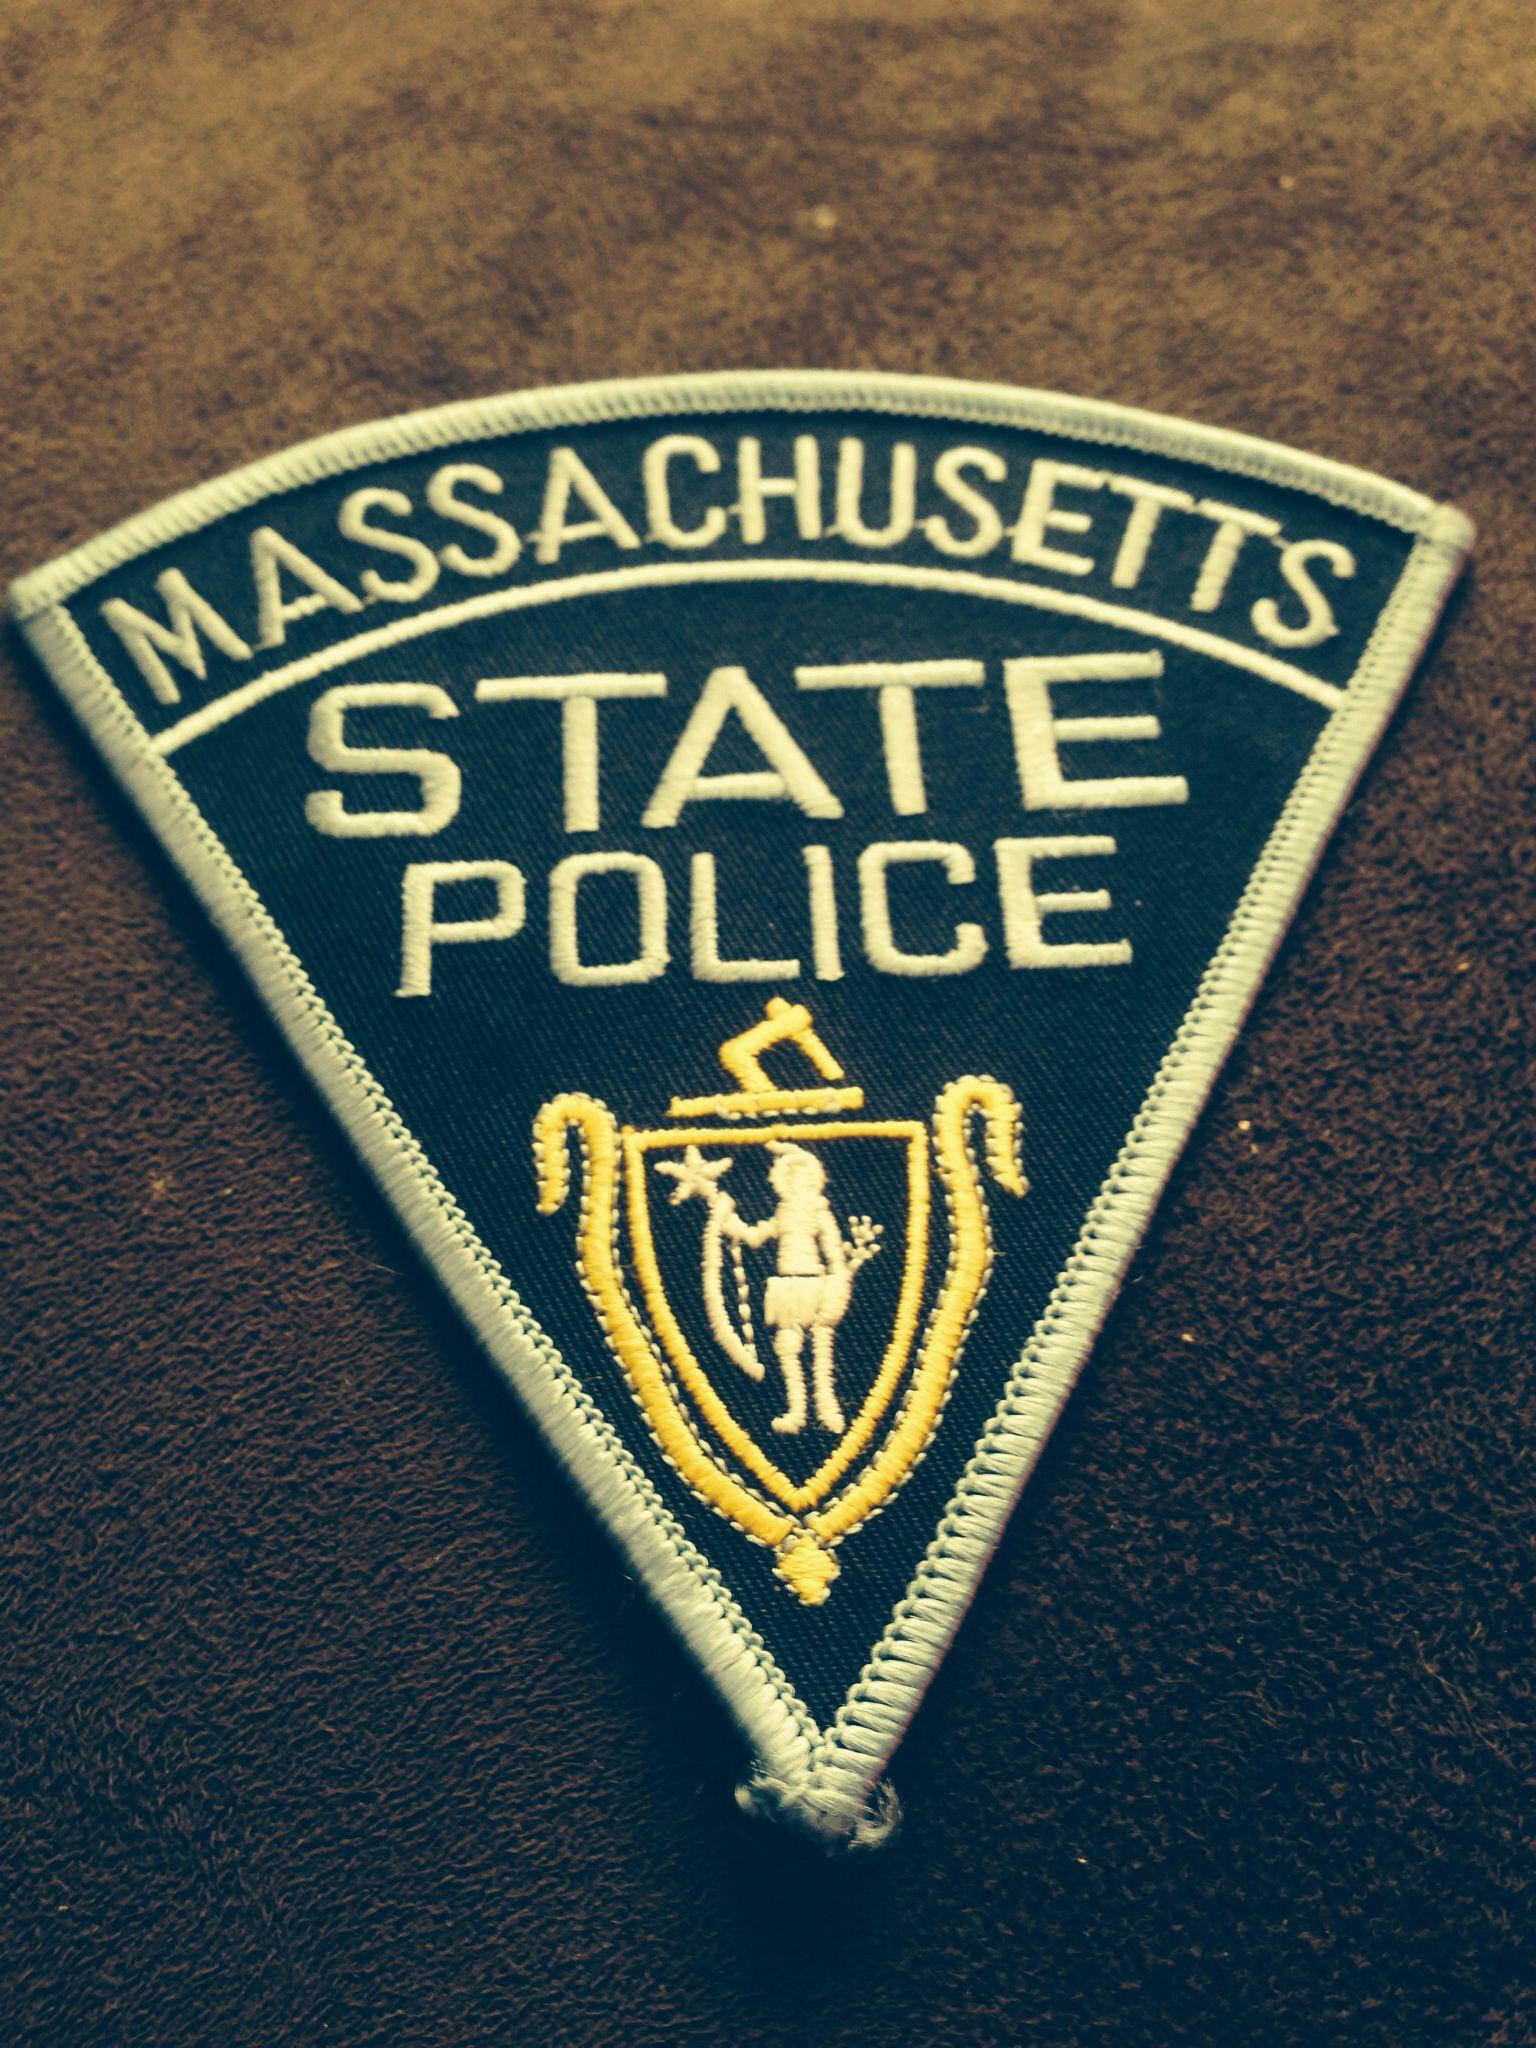 Massachusetts State Police State police, Police, Police